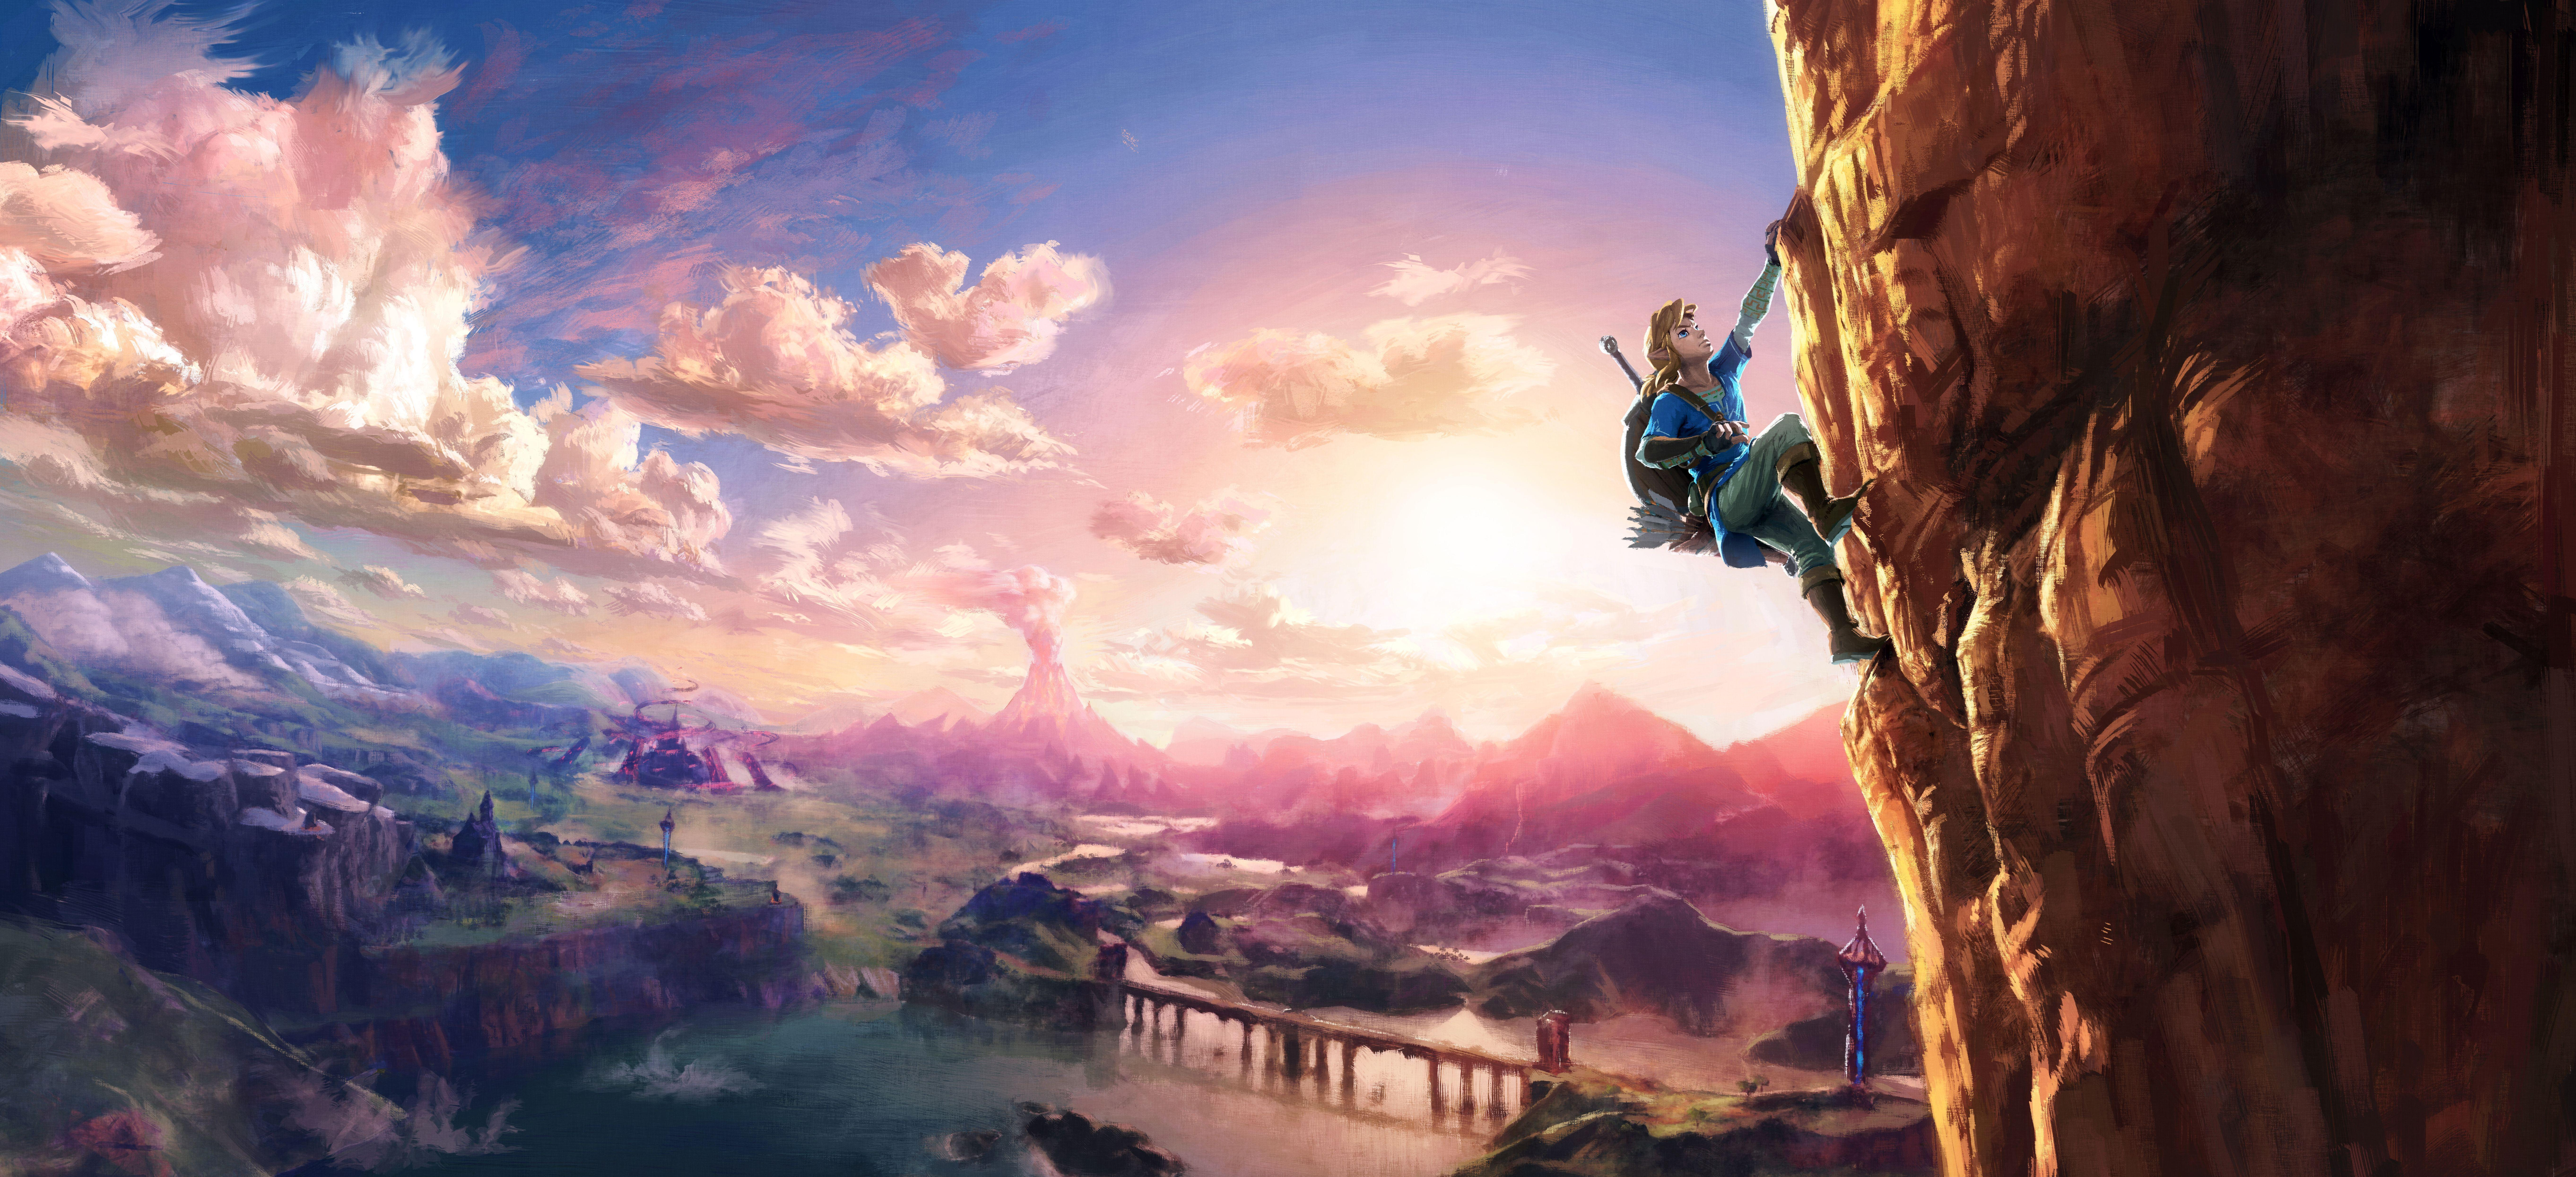 177 The Legend Of Zelda Breath Of The Wild Hd Wallpapers